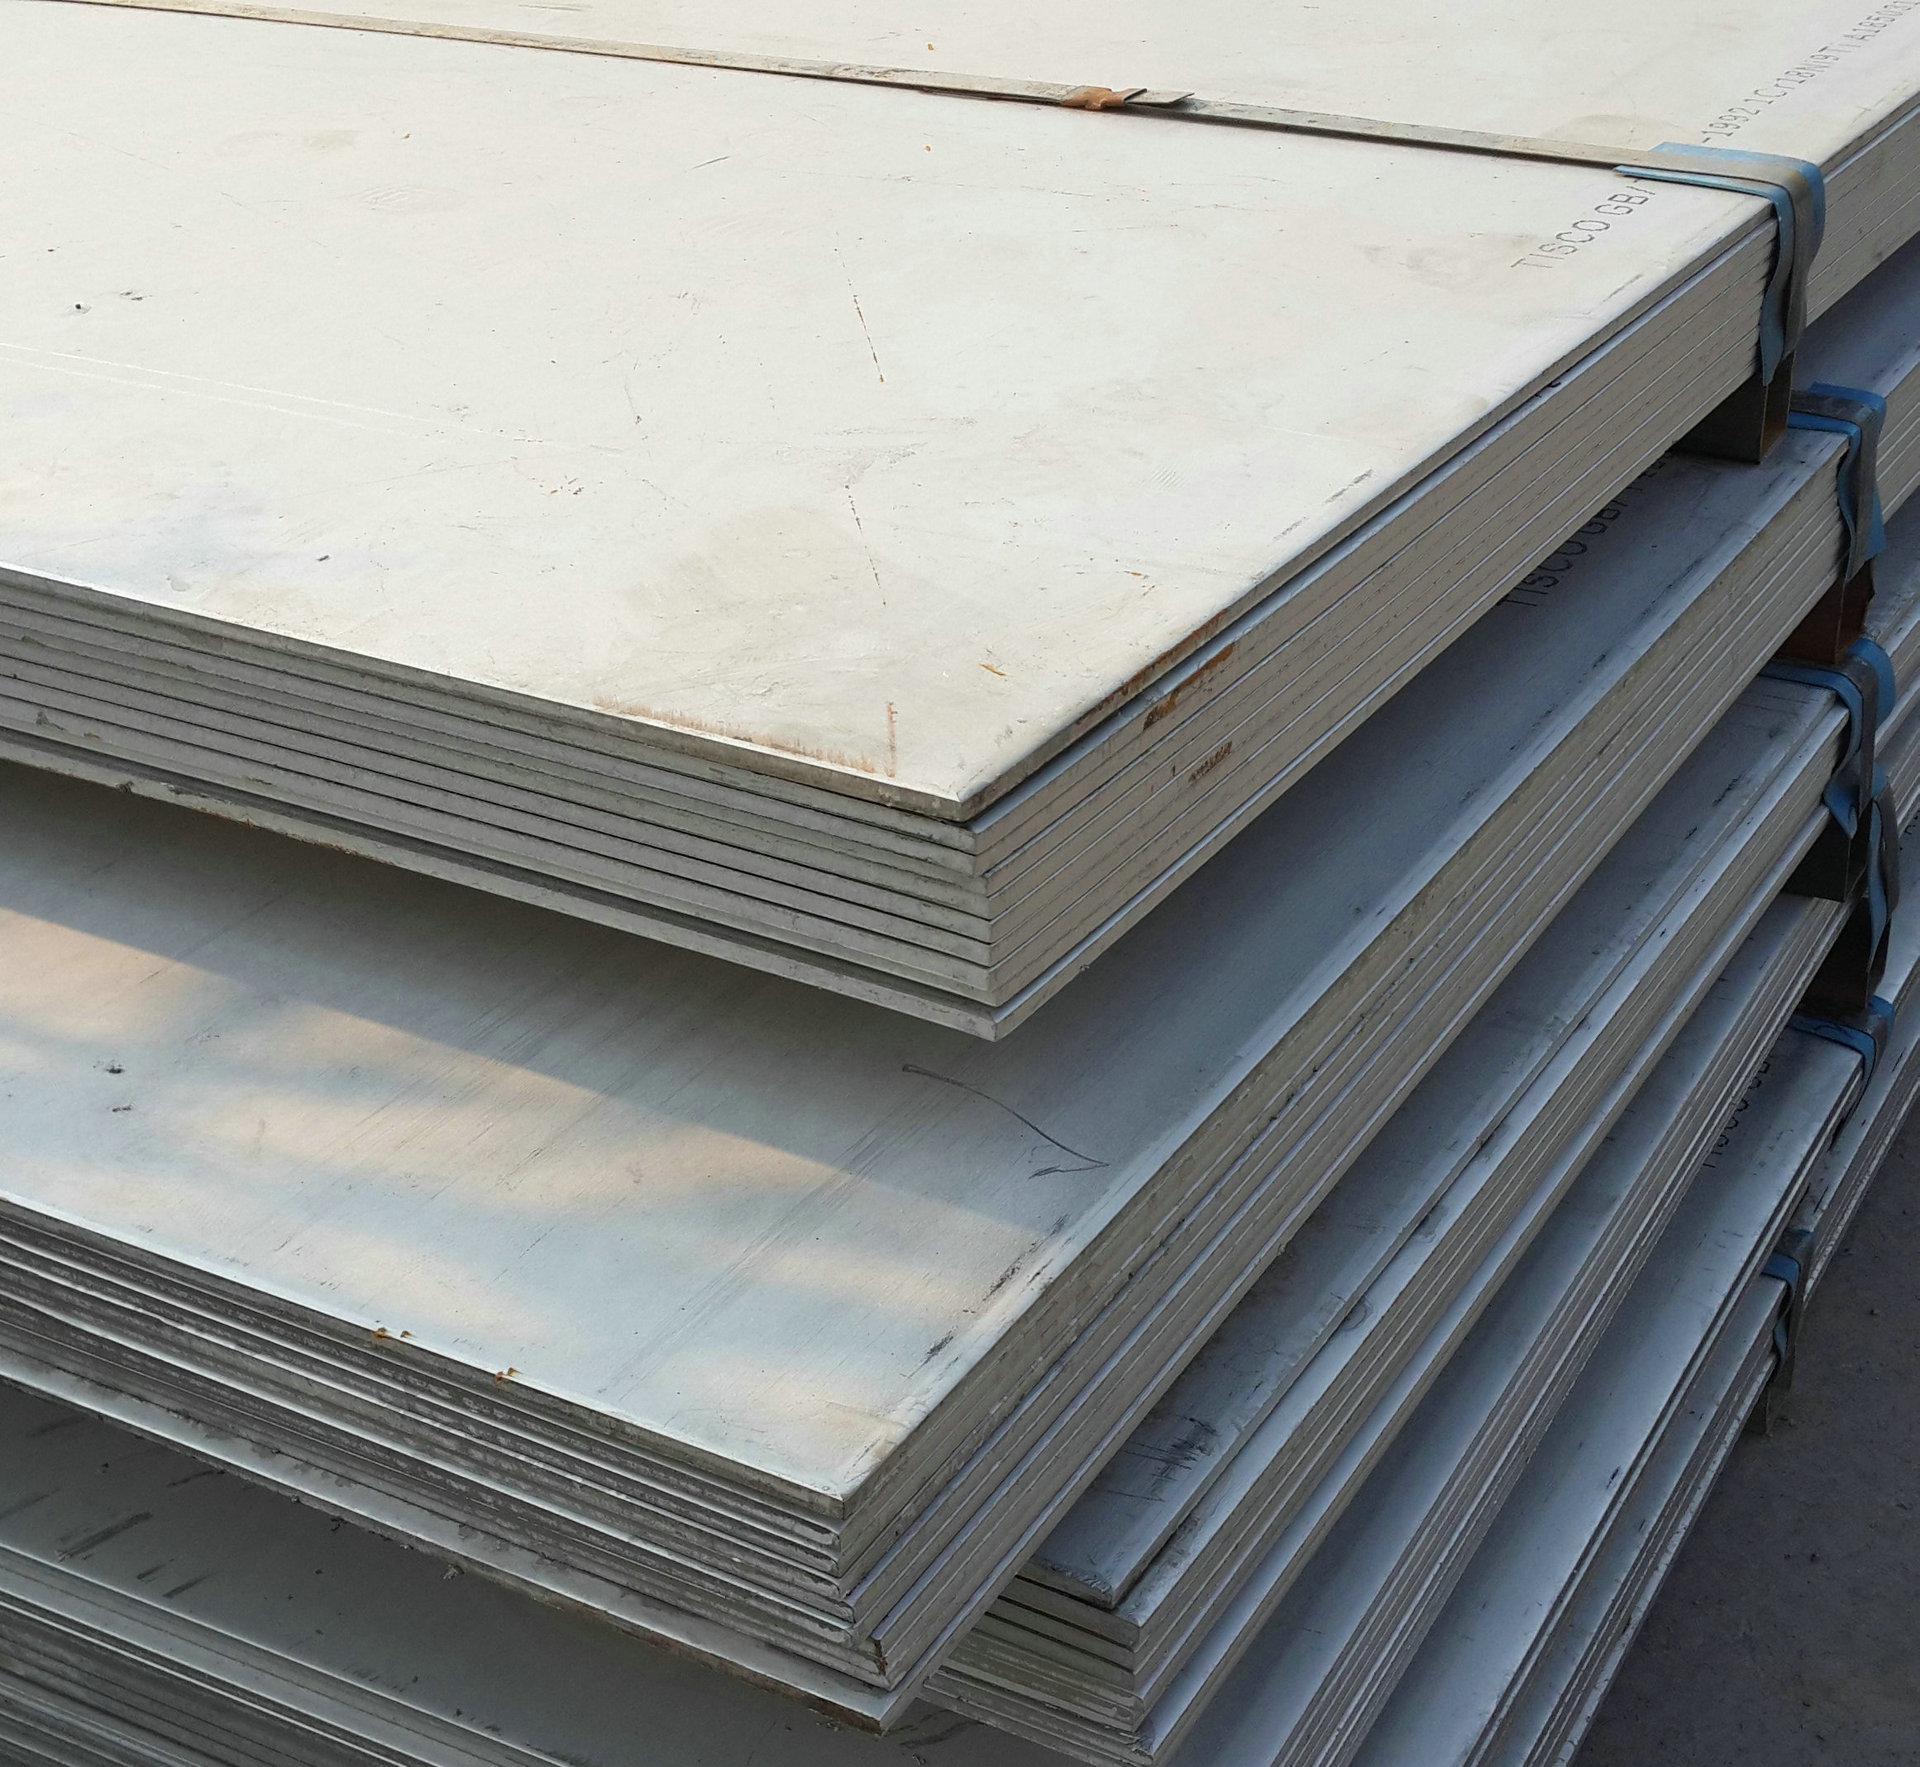 904L不锈钢工业板价格,904L不锈钢工业板供应商,904L不锈钢工业板厂家直销